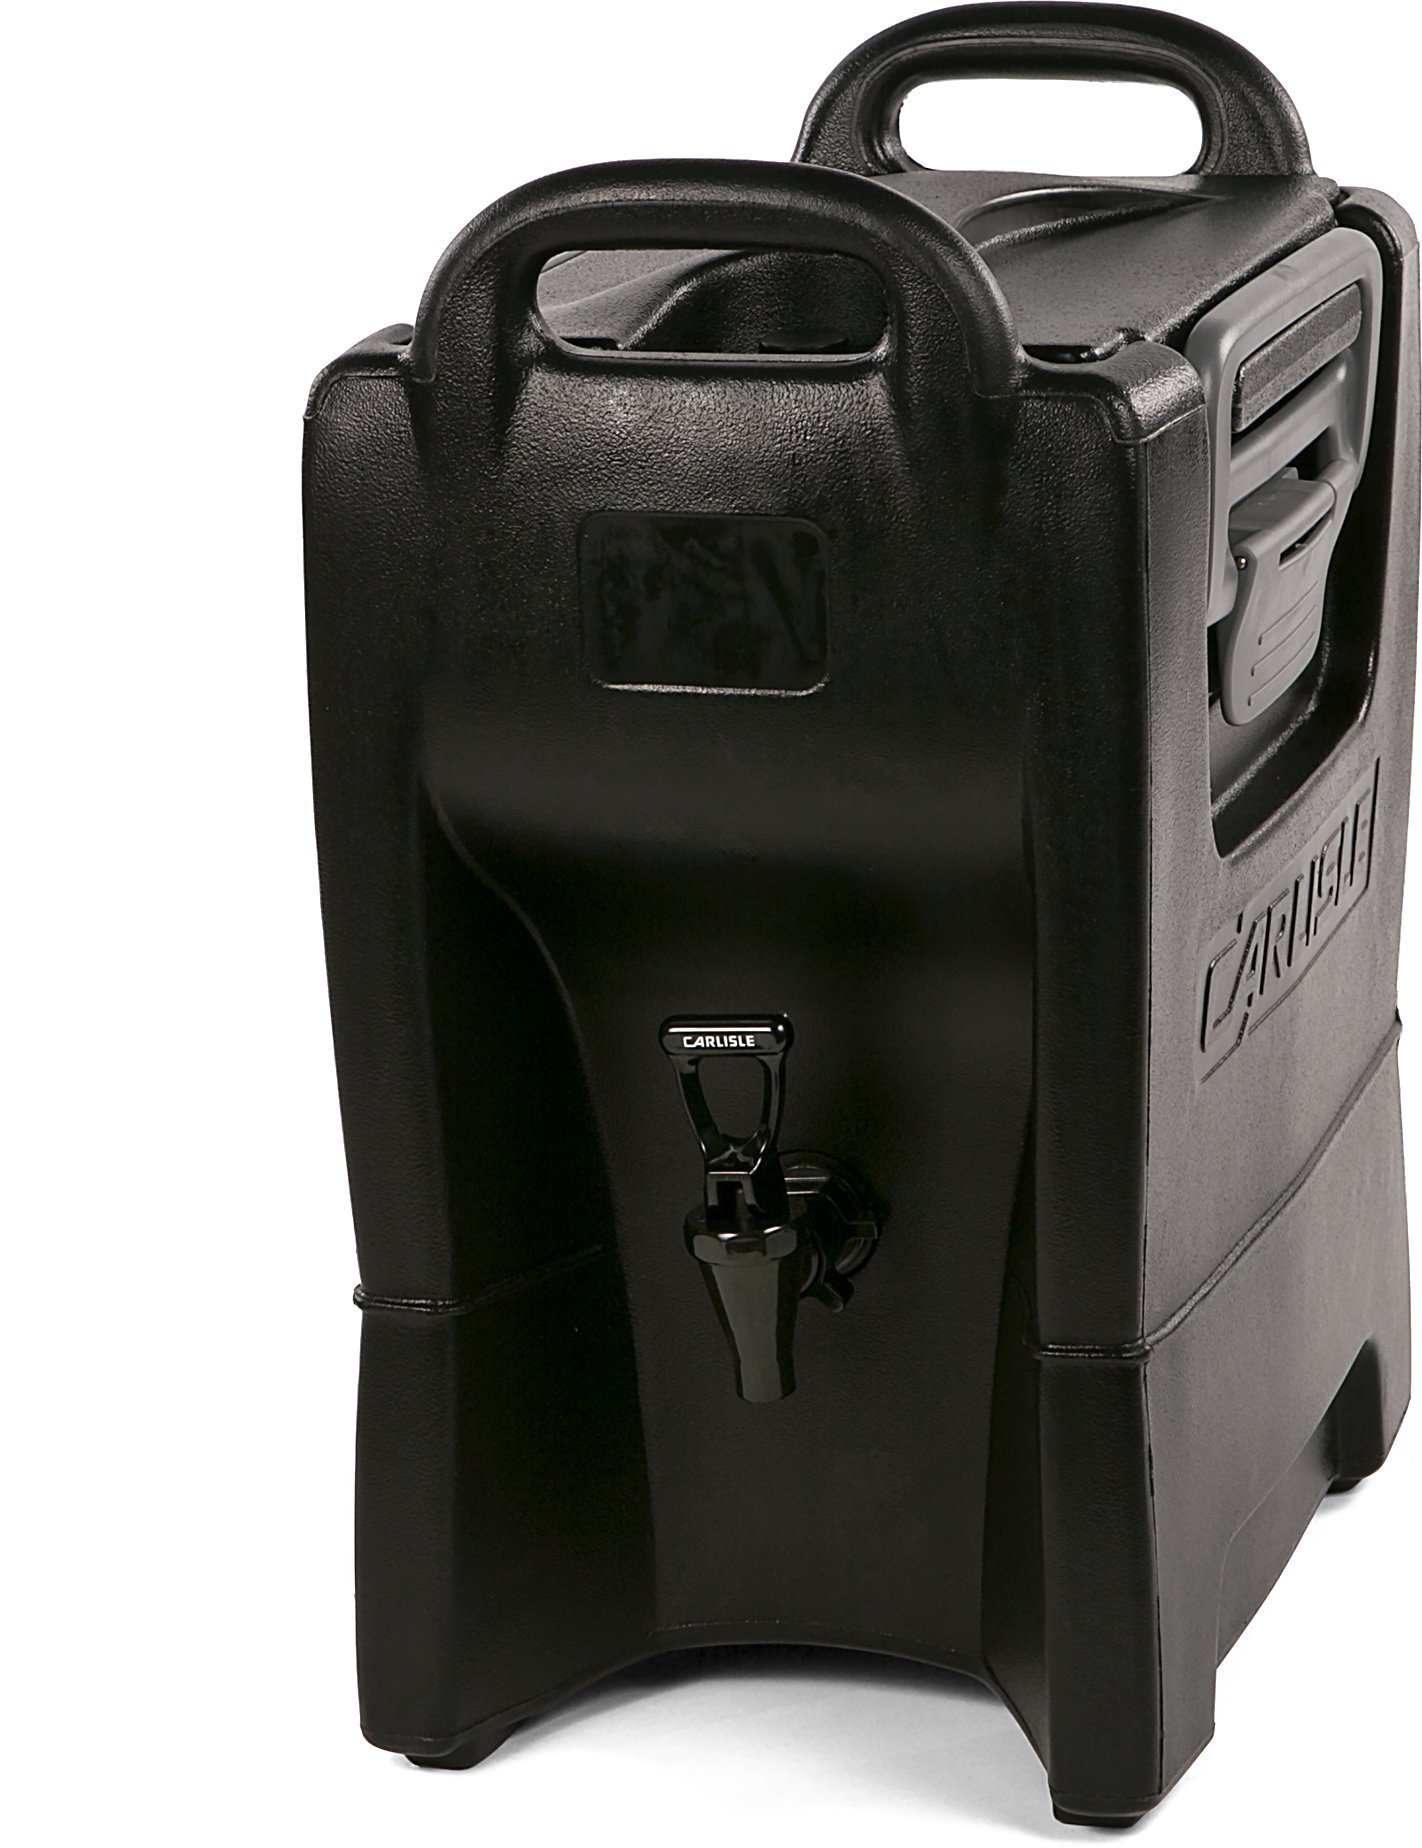 Carlisle IT25003 Cateraide IT Insulated Beverage Server / Dispenser, 2.5 Gallon, Onyx